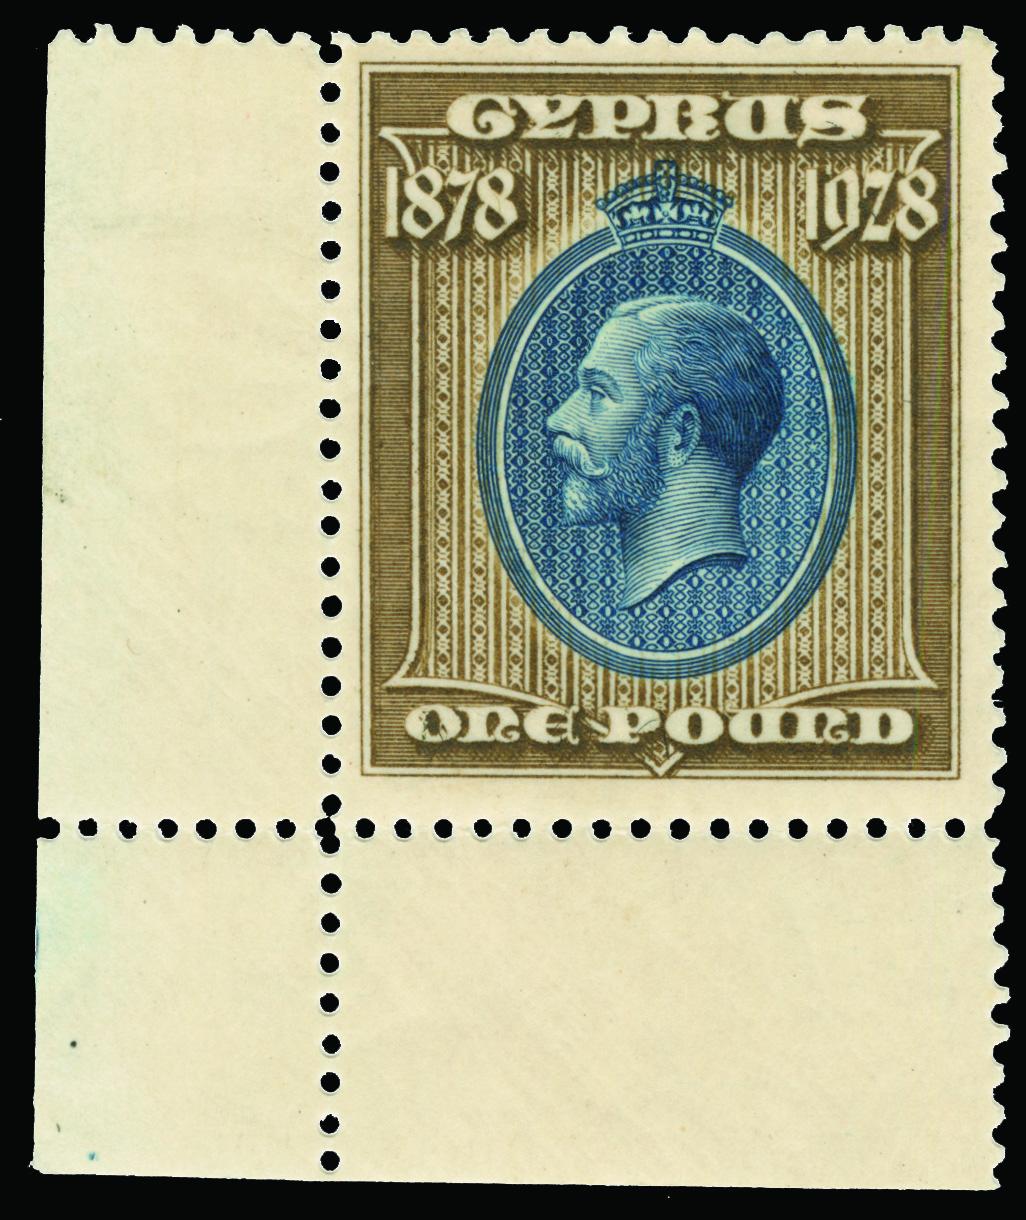 Lot 571 - Hong Kong  -  COLONIAL STAMP CO. Auction #135 - Public Auction